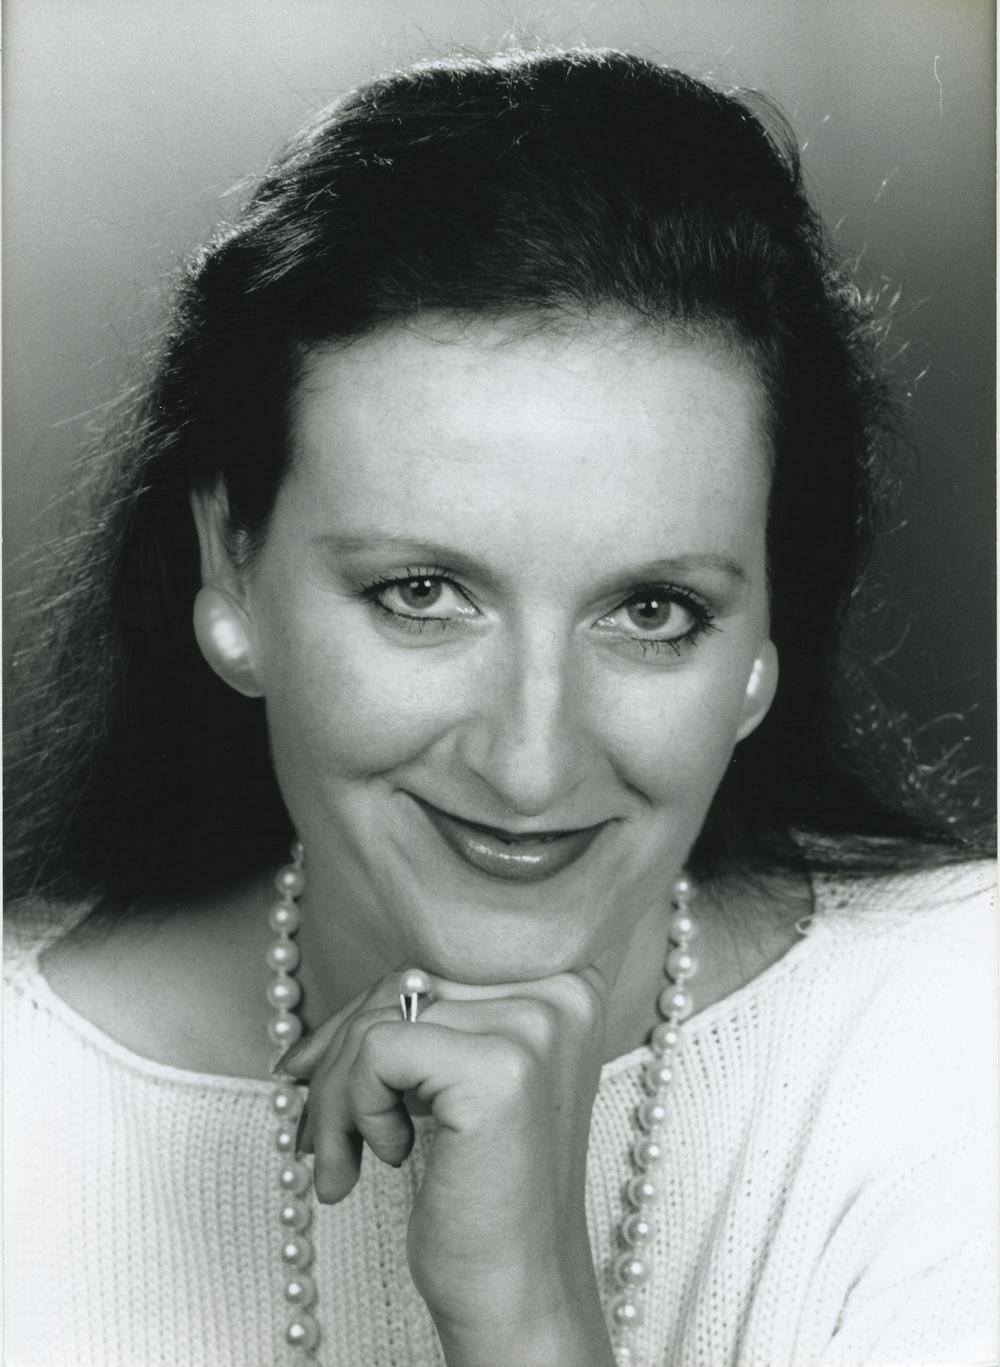 Nicola Bowie